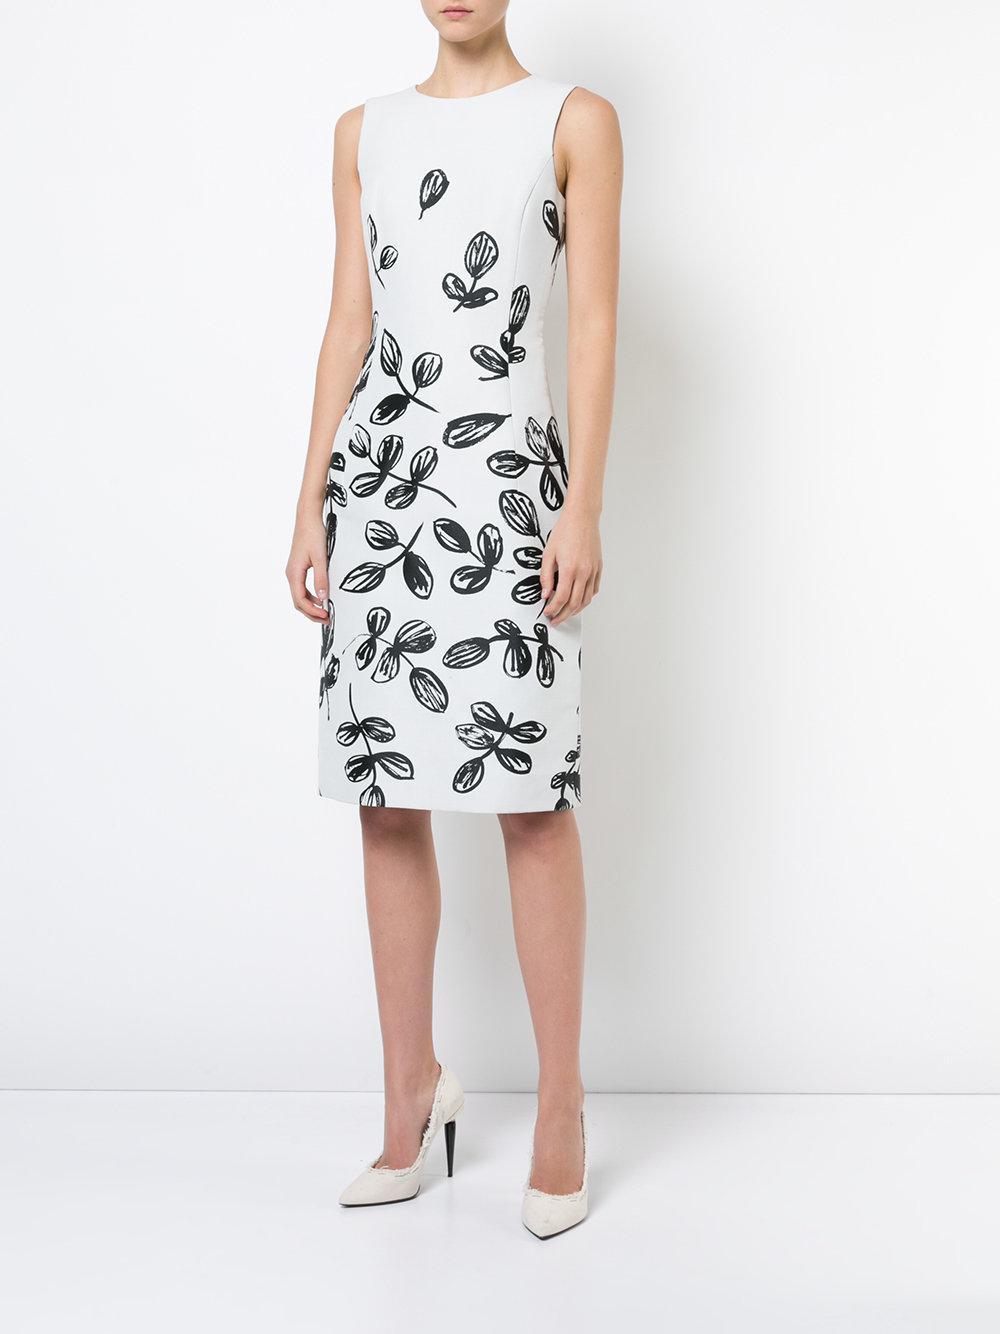 Oscar De La Renta Floral Print Dress In White Lyst